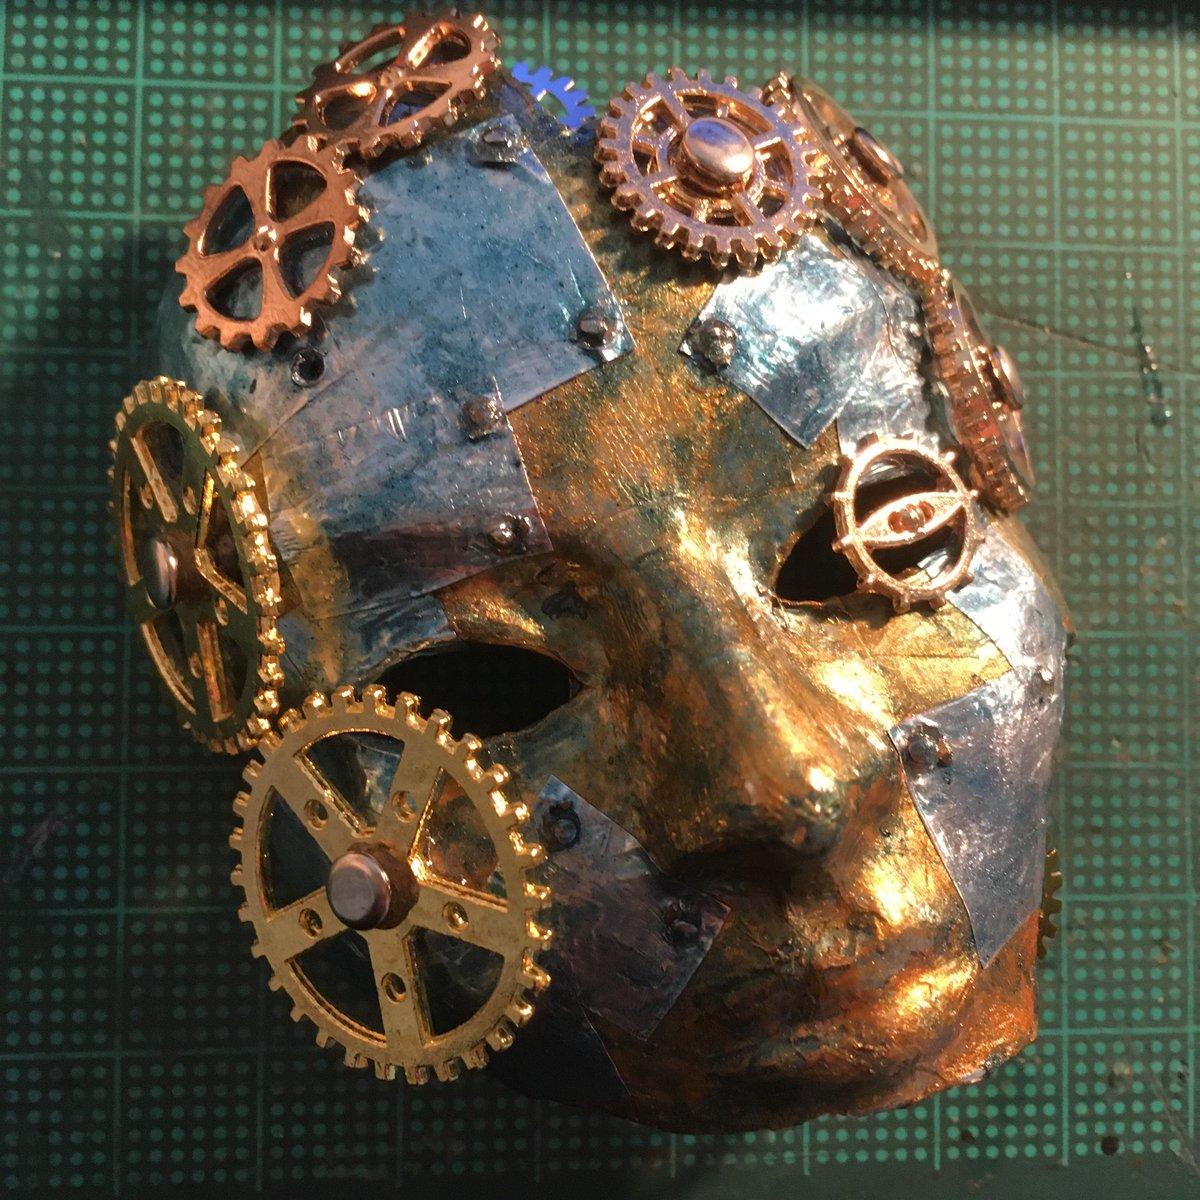 Work in progress... #handmade #diy #craft #mask #doll #steampunk